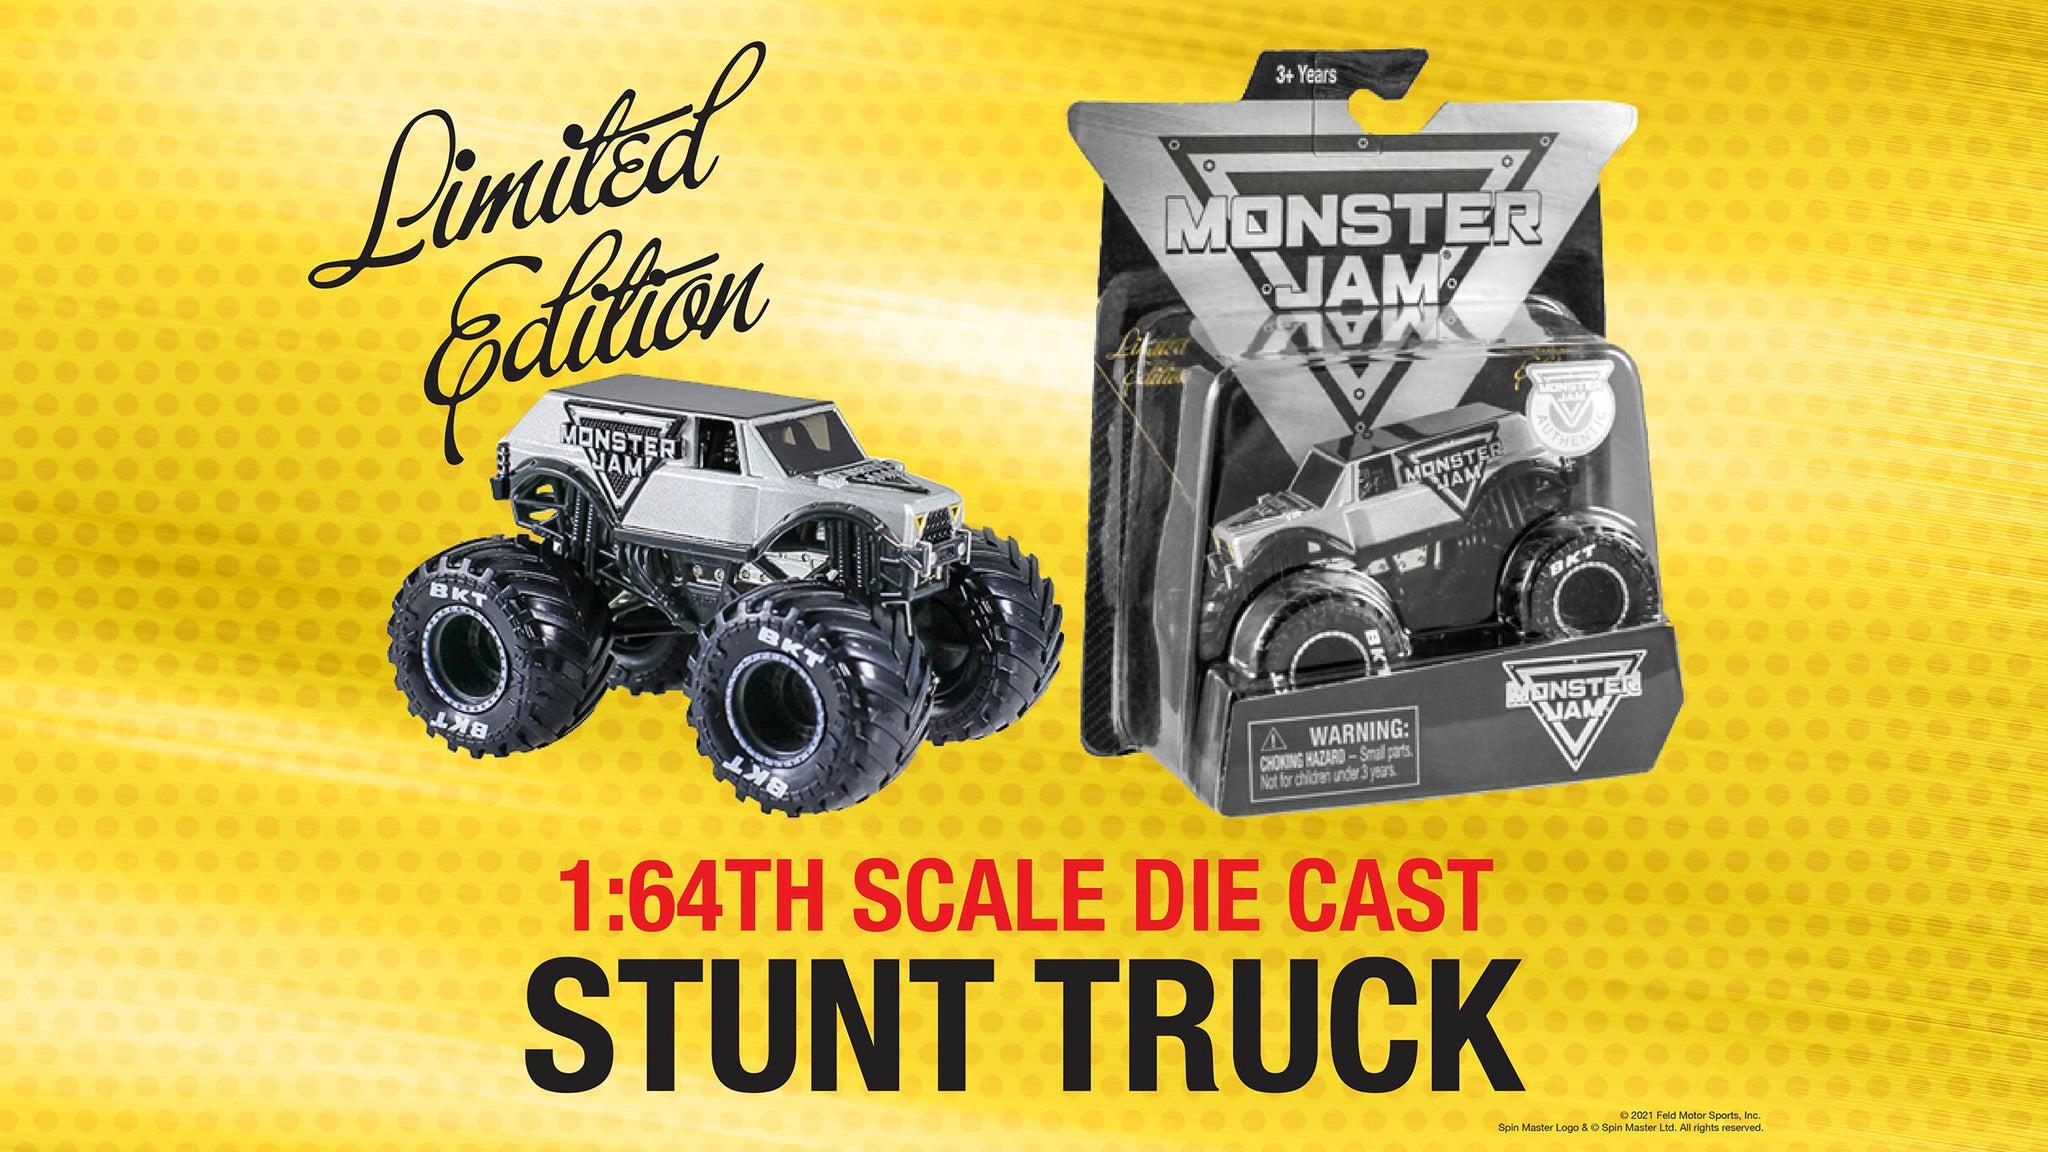 Monster Jam – 1/64th Scale Stunt Truck presale code